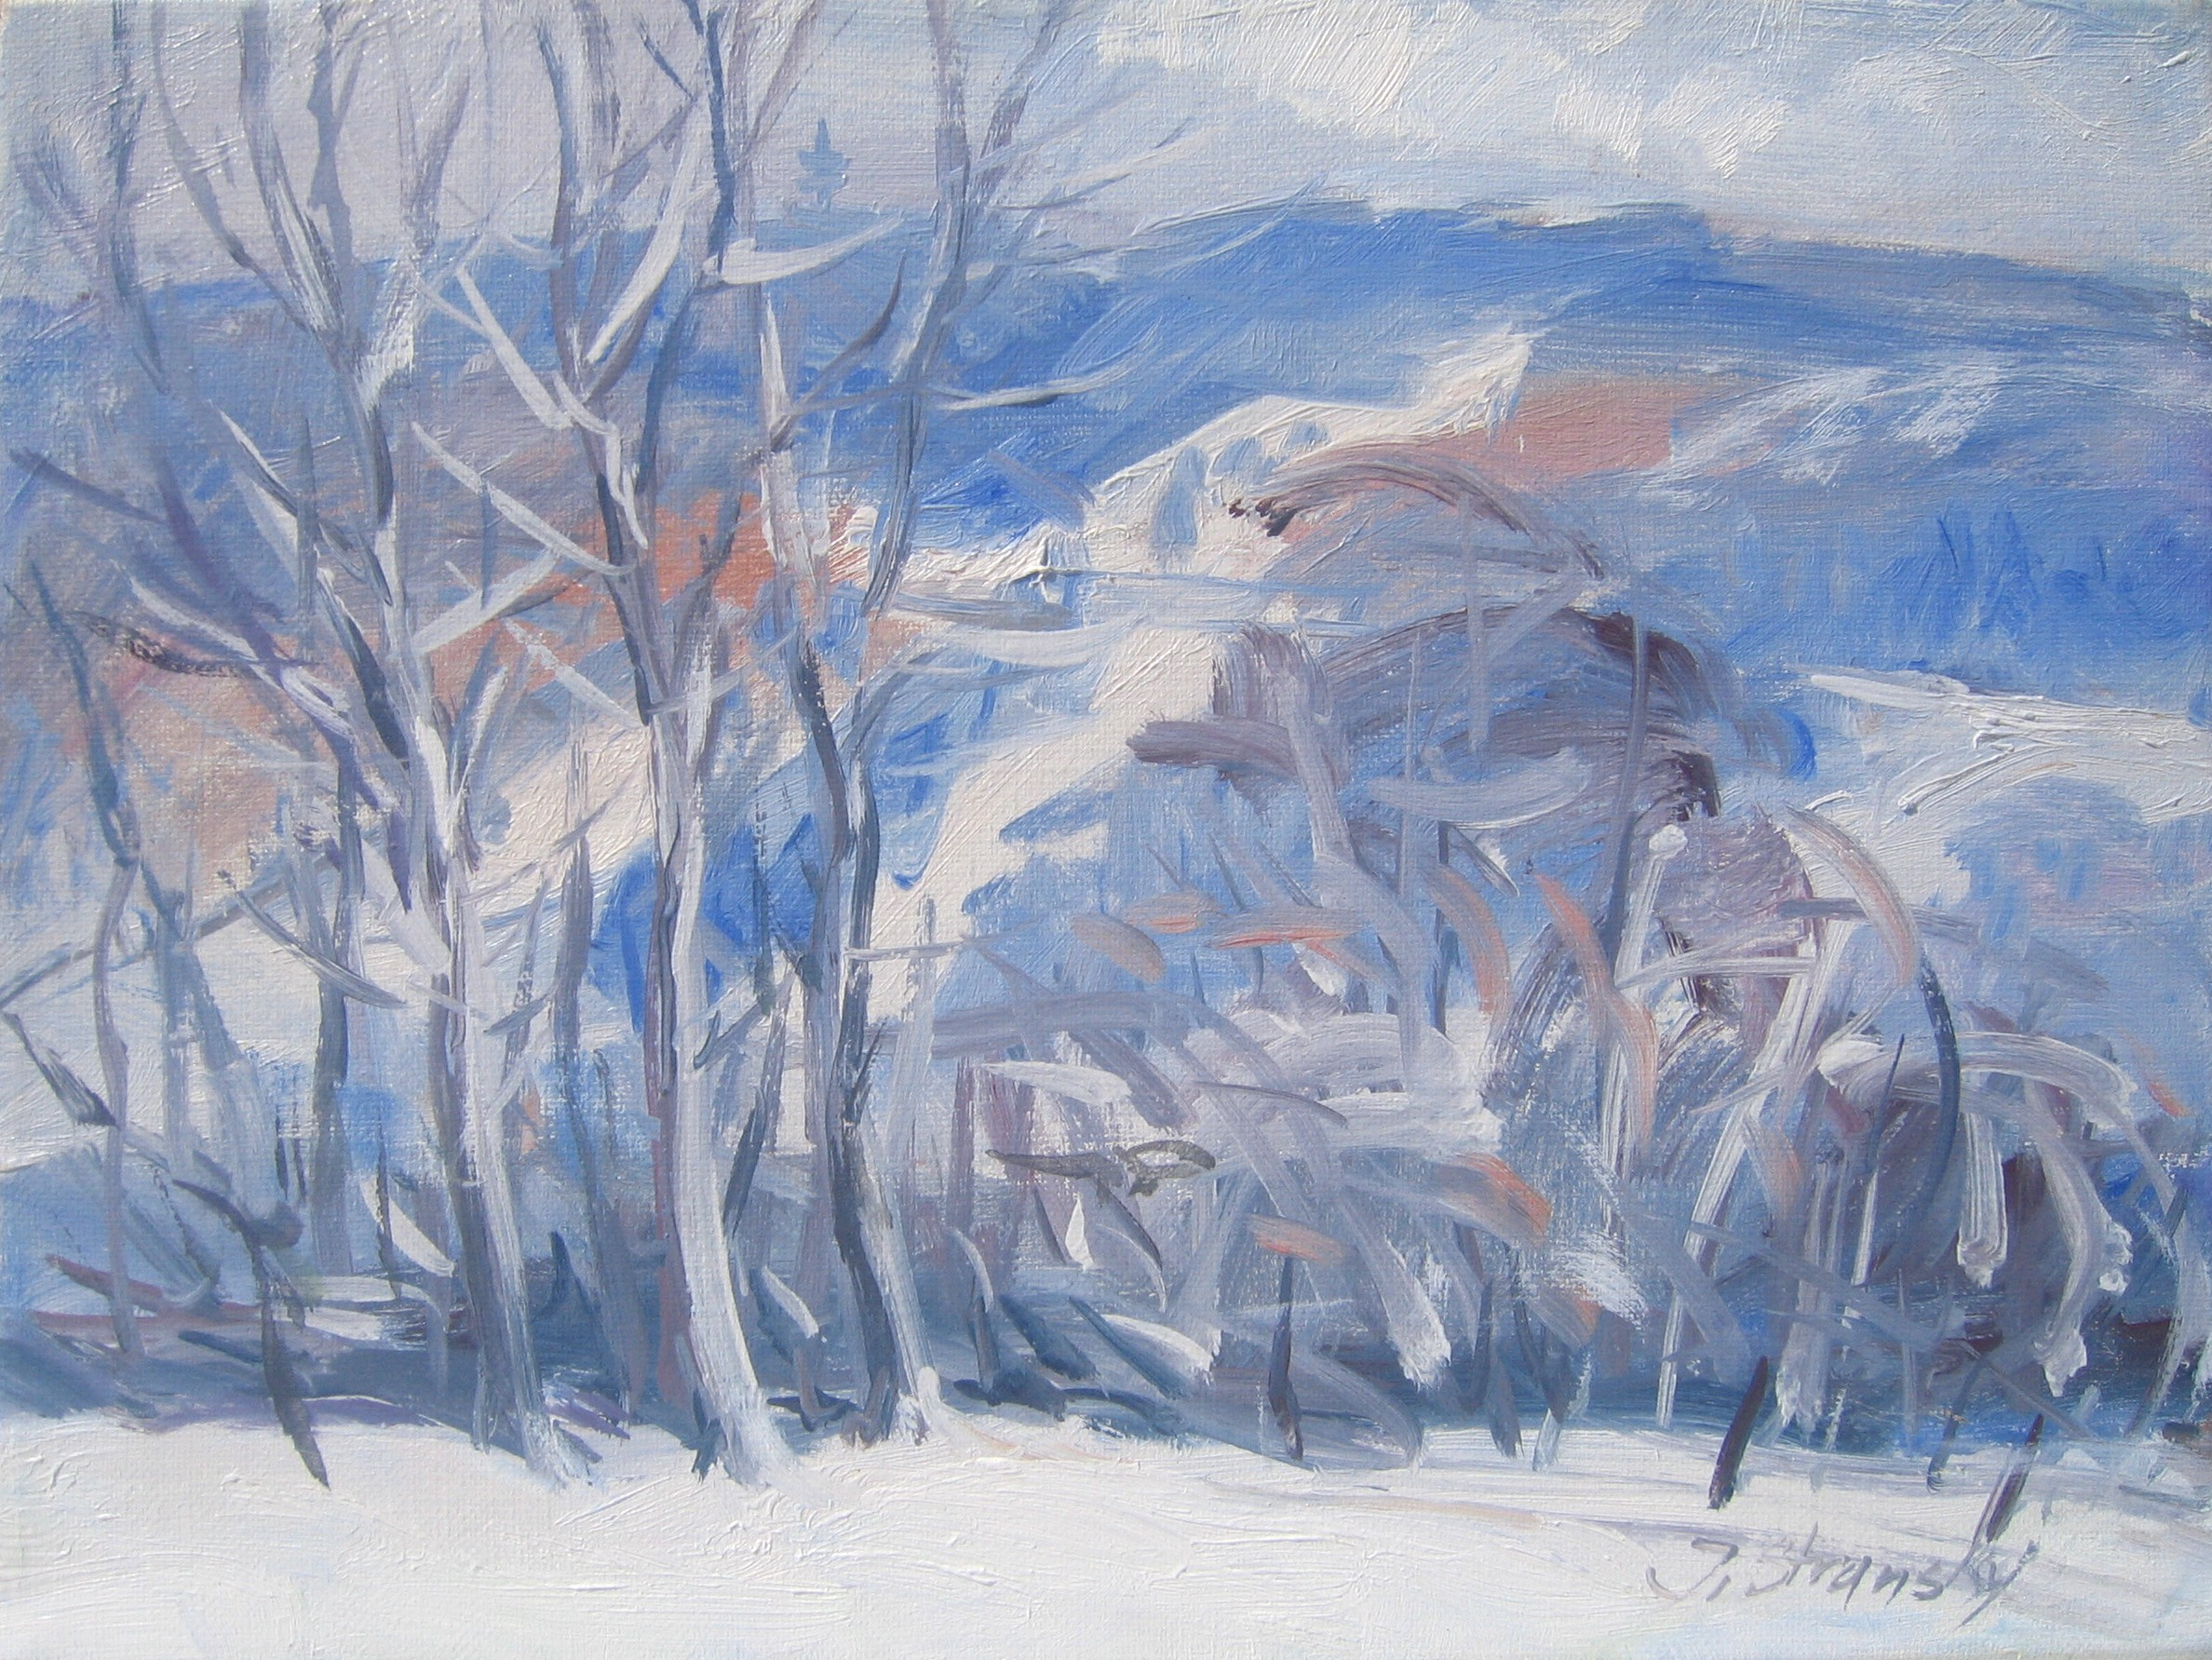 Ebbegebirge im Winter (Nordhelle) 30x40